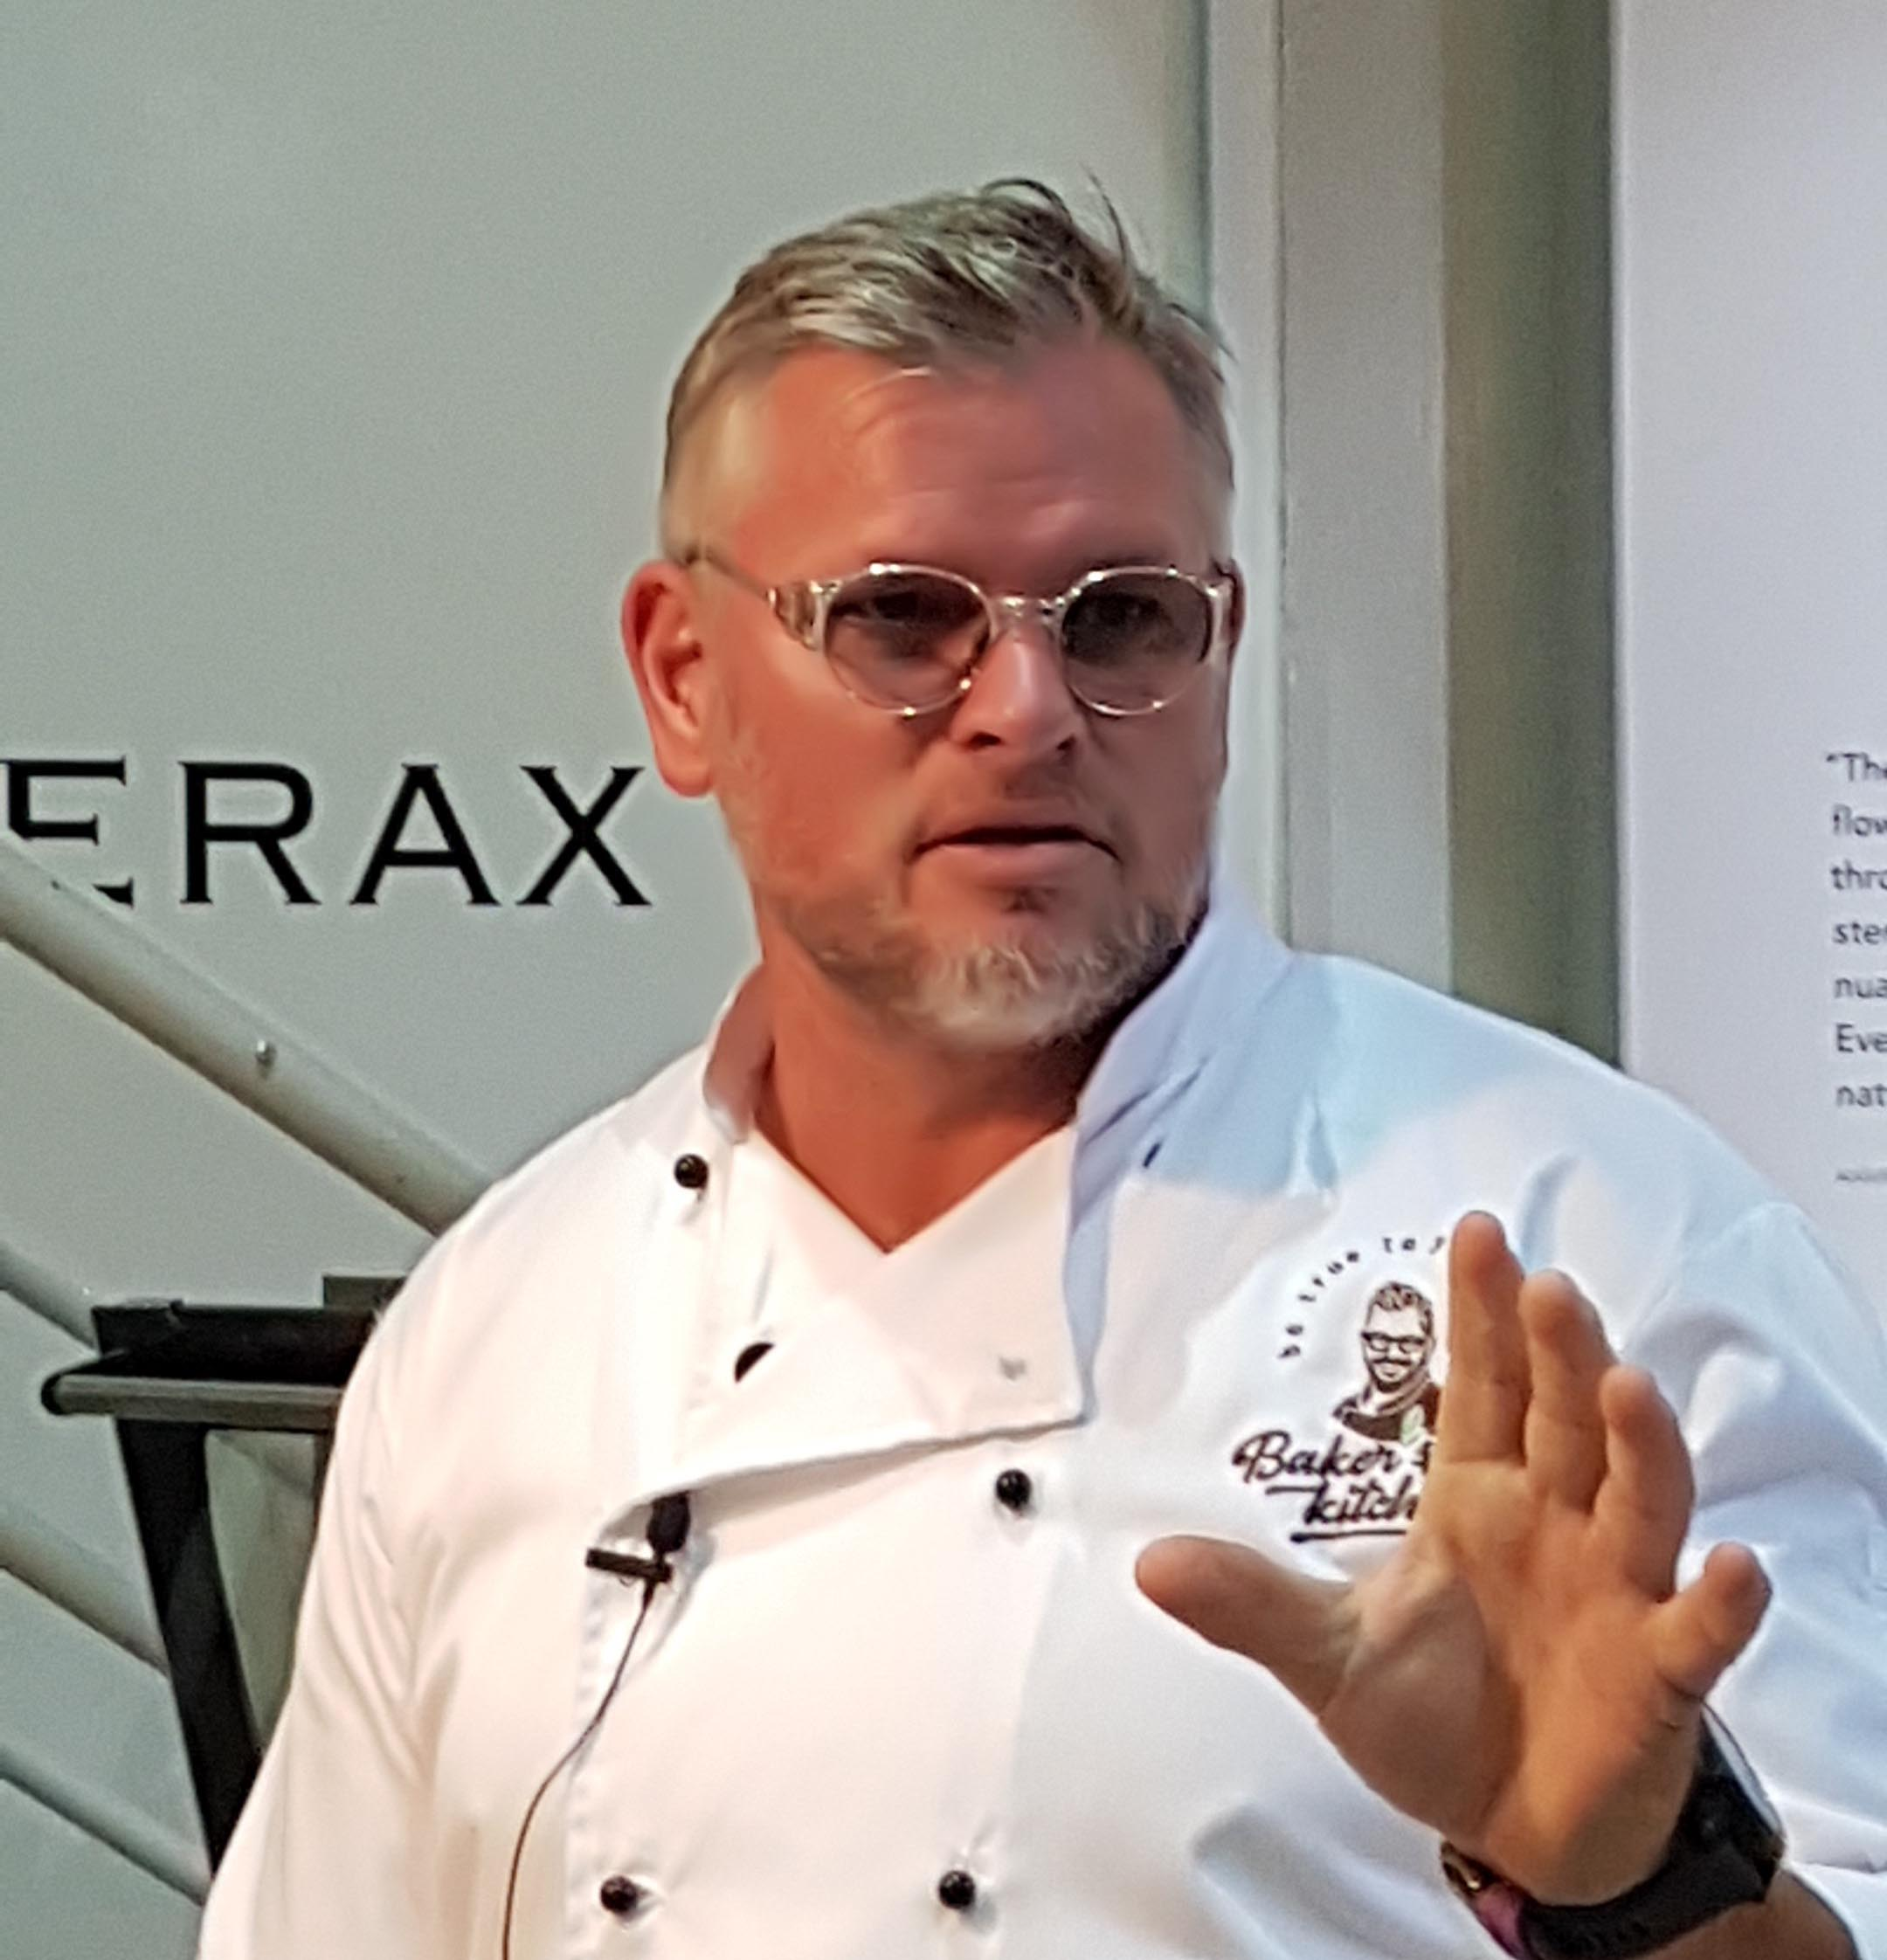 Sven Mostegl